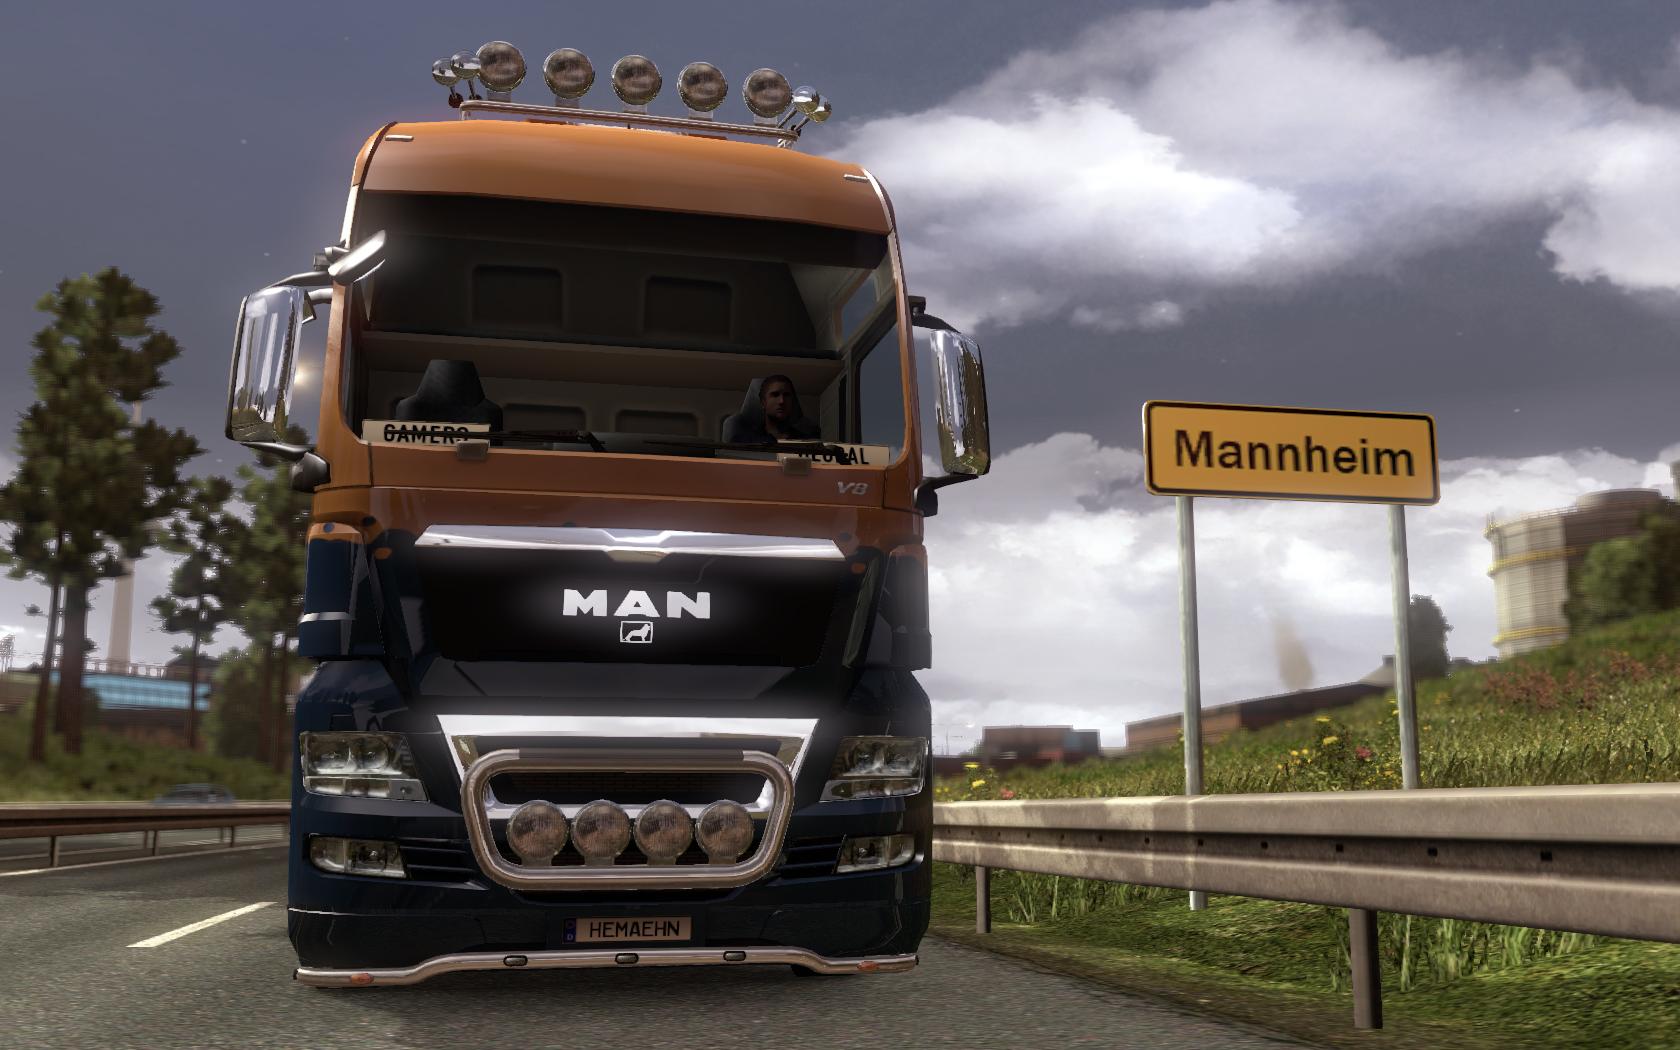 euro truck simulator 2 patch 1 9 bringt besseres. Black Bedroom Furniture Sets. Home Design Ideas